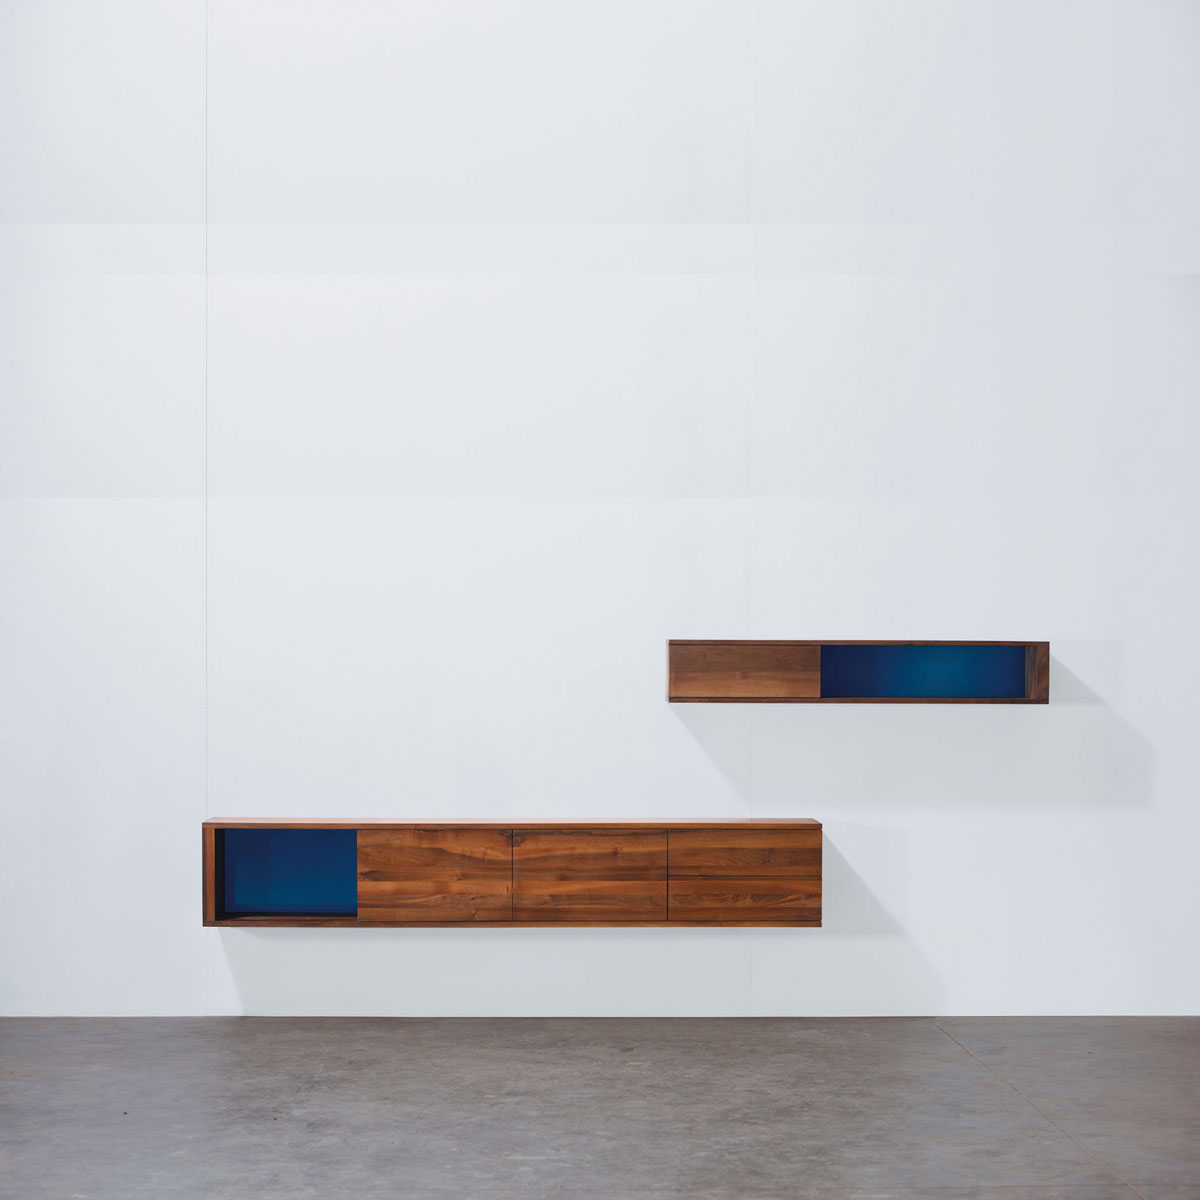 Mueble modular log de pared en madera moderno y artesano for Diseno de muebles de madera modernos